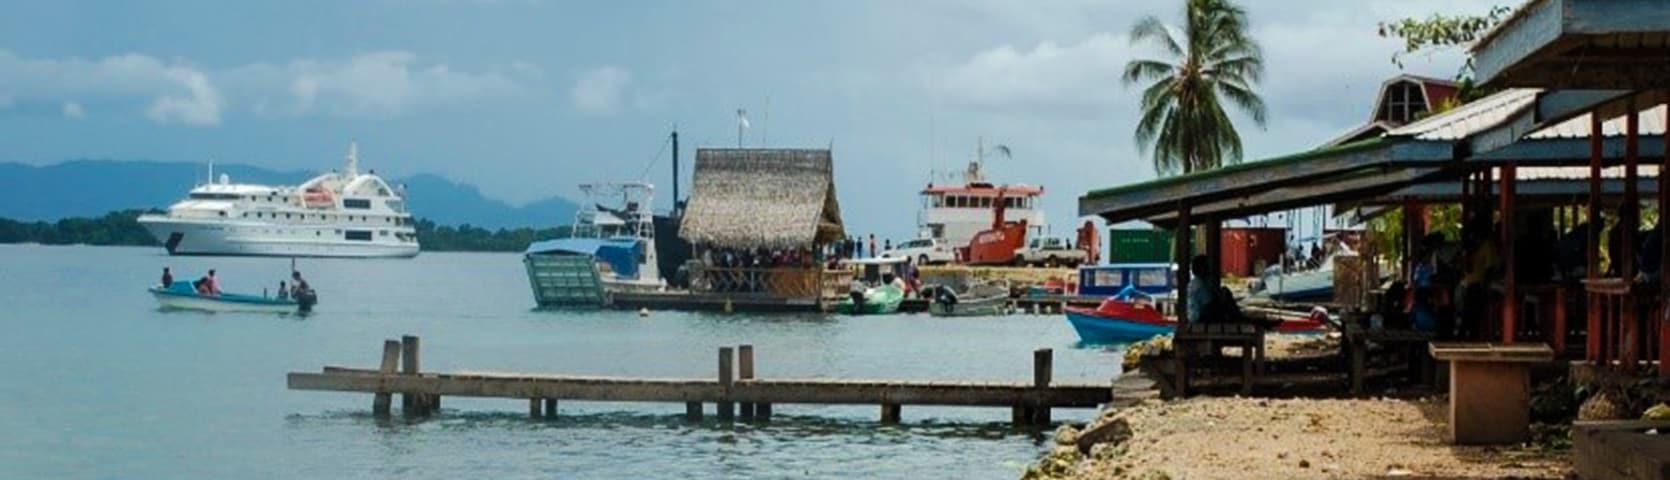 Gizo Waterfront 1